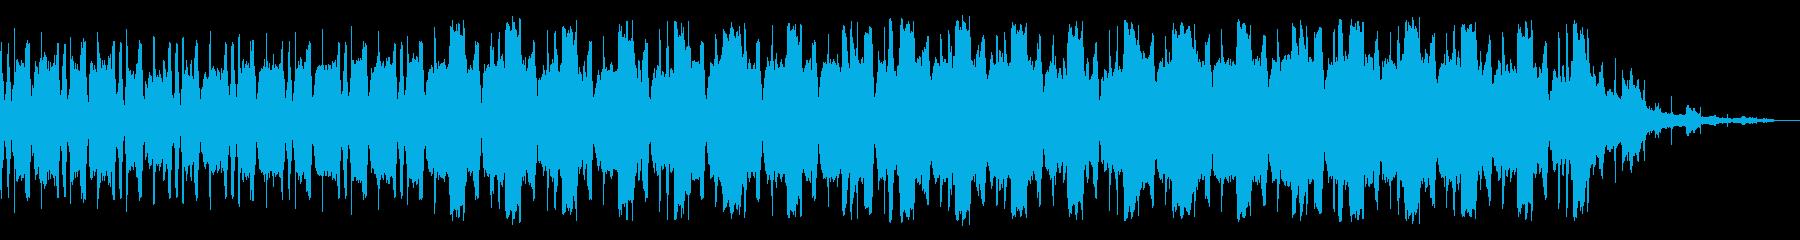 lo fi ヒップホップです。の再生済みの波形